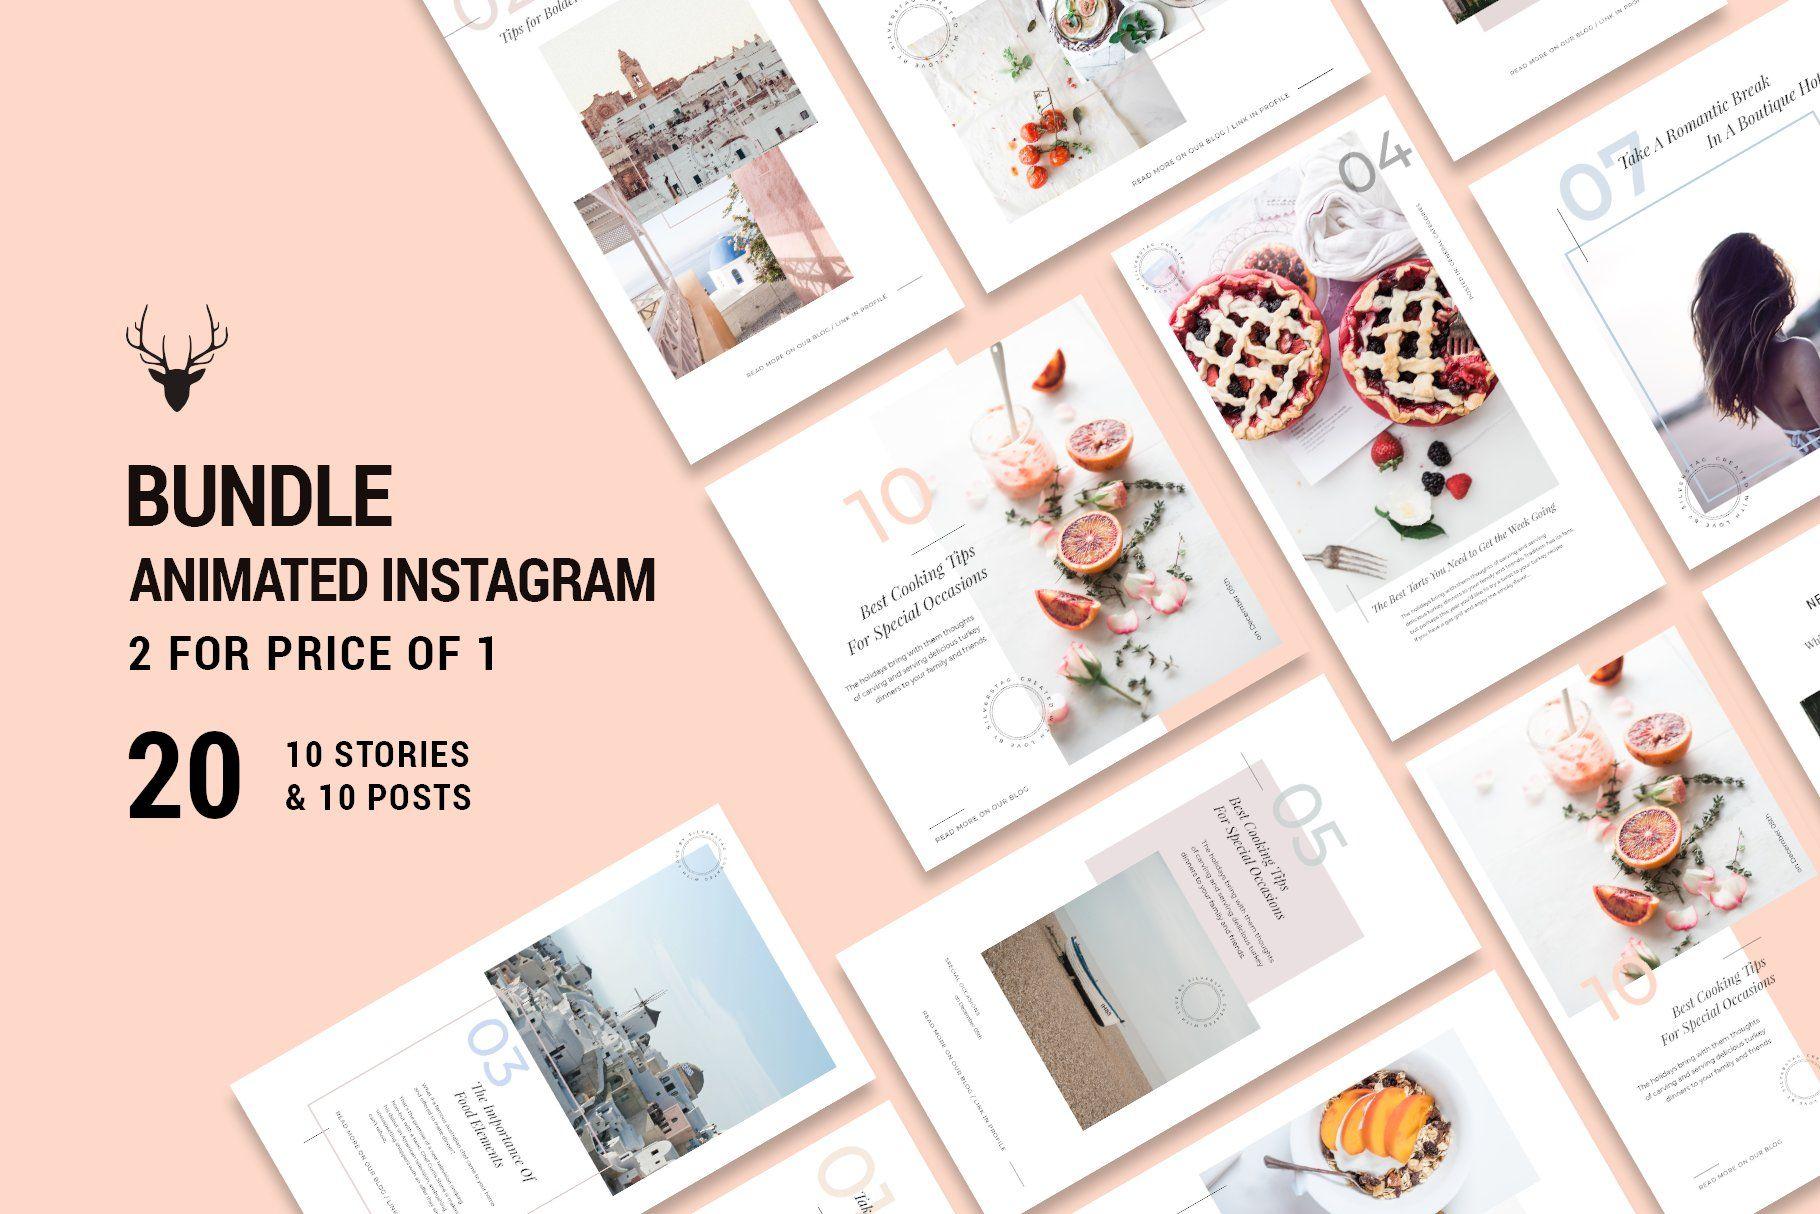 2 for 1 bundle animated insta pack instagram post